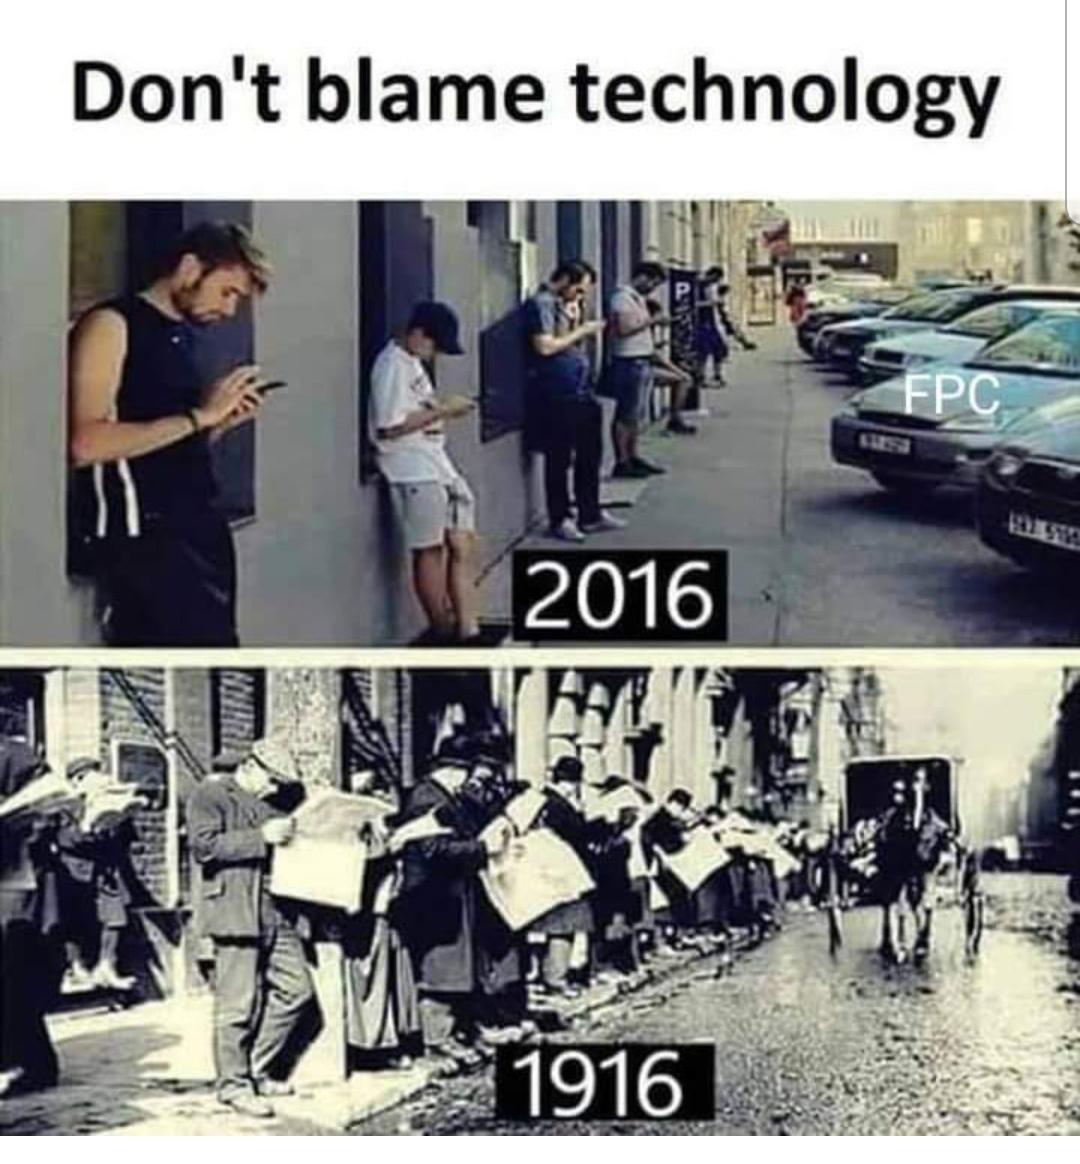 Tehnology.jpeg